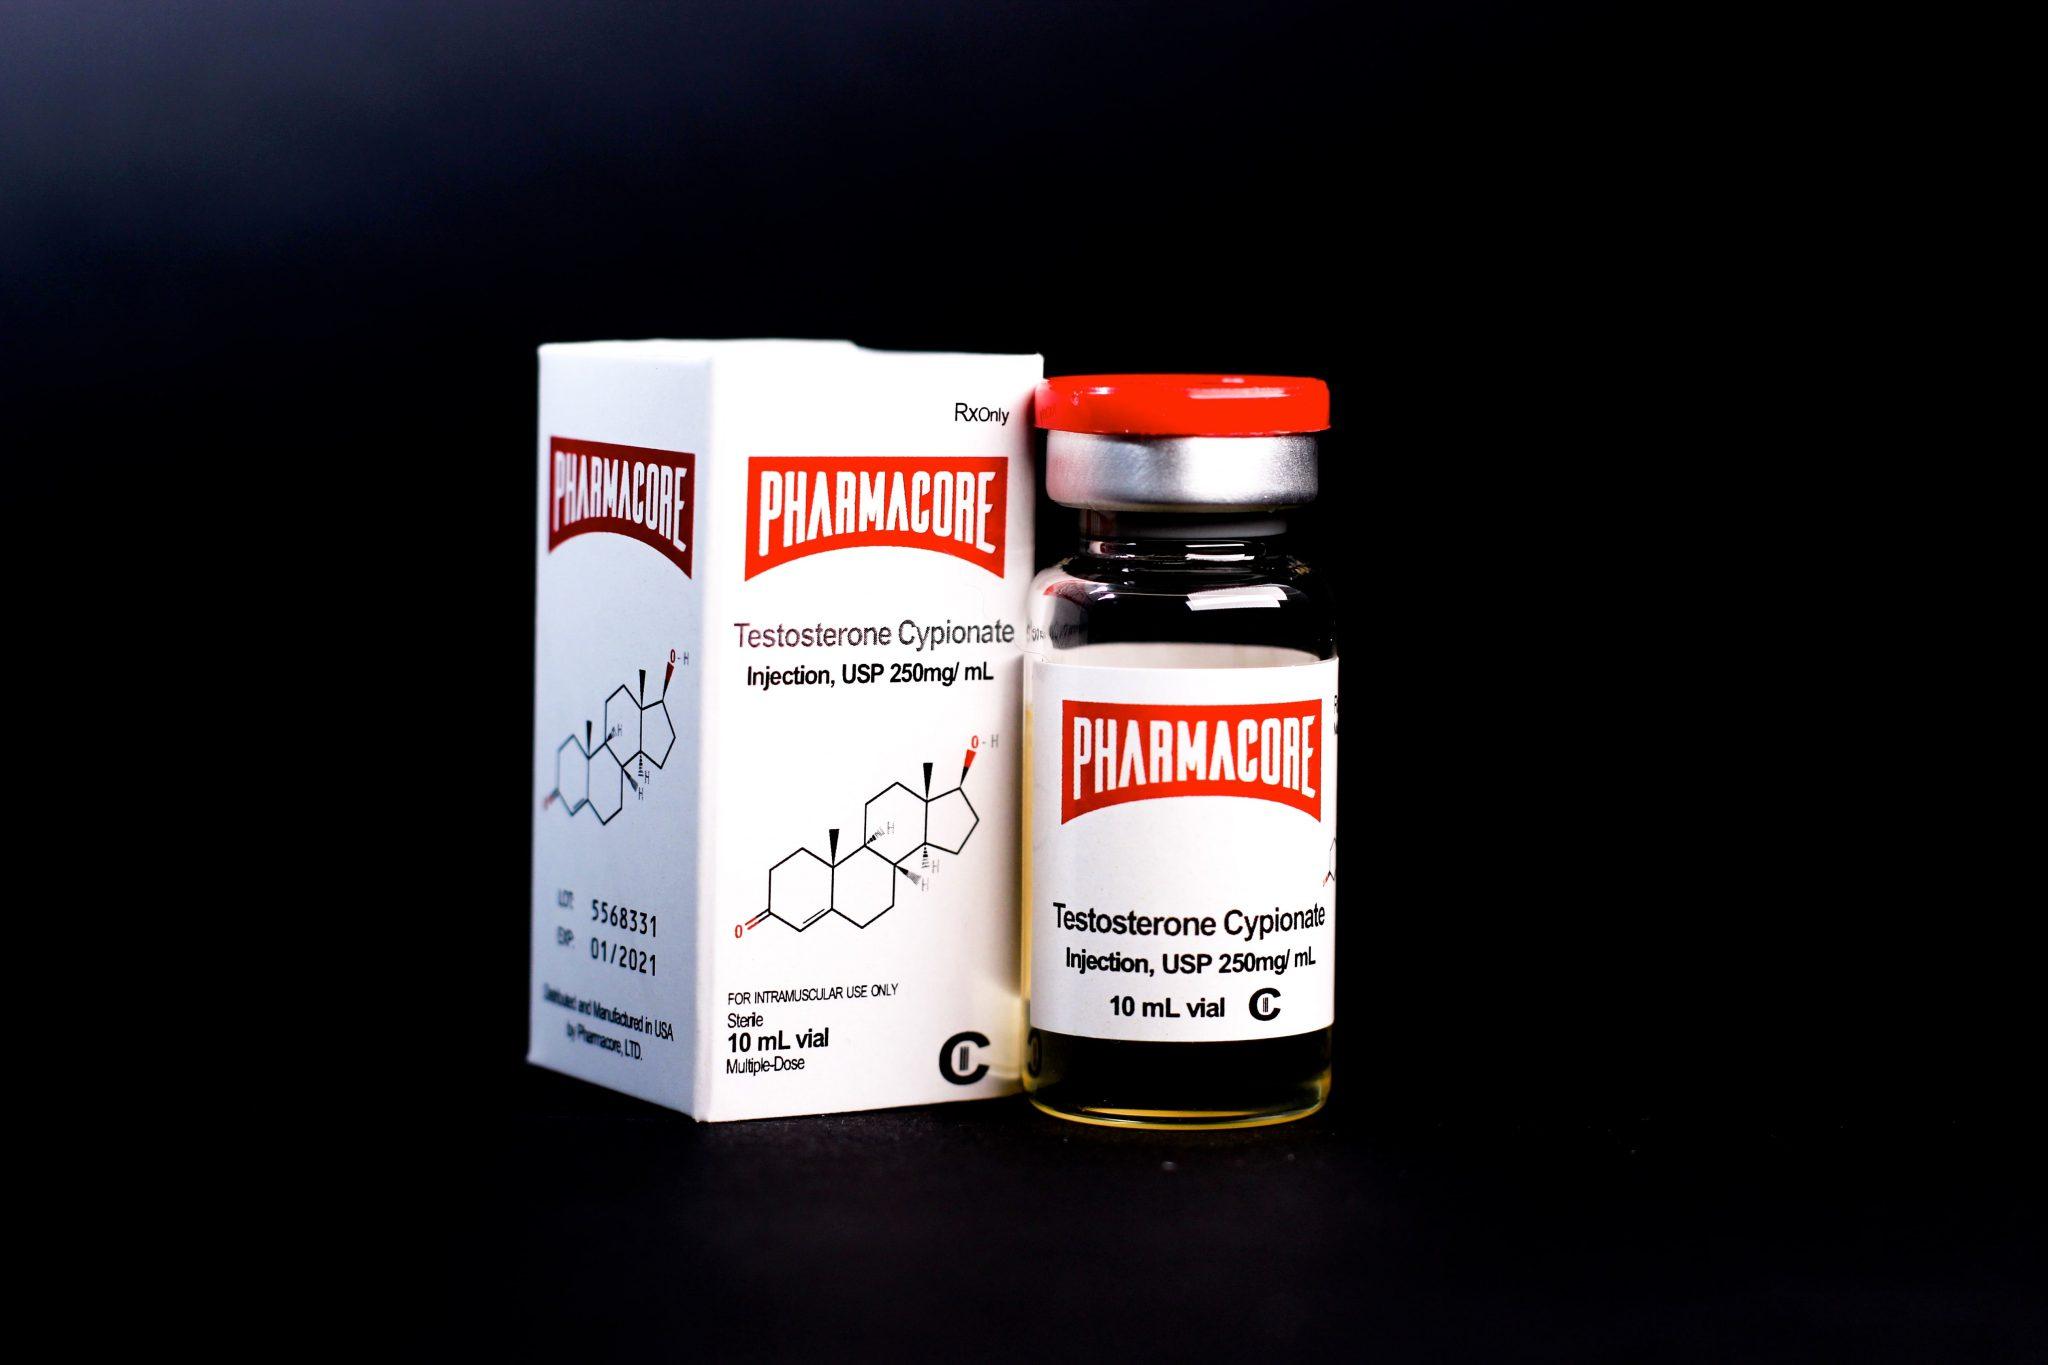 Testoterone Cypionate 250 mg/mL